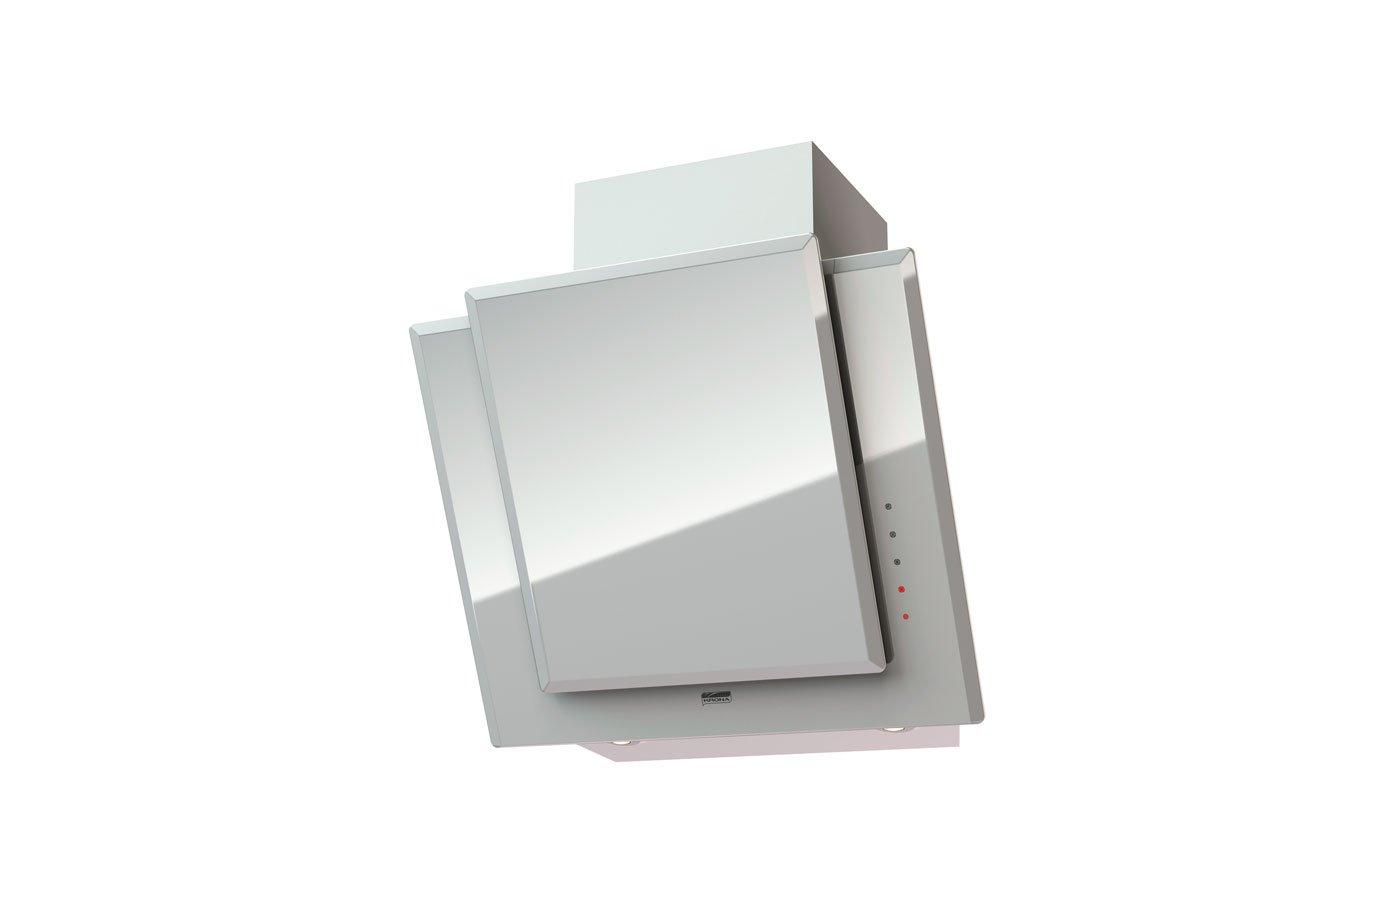 Вытяжка KRONA NATALI 600 WHITE 3P-S